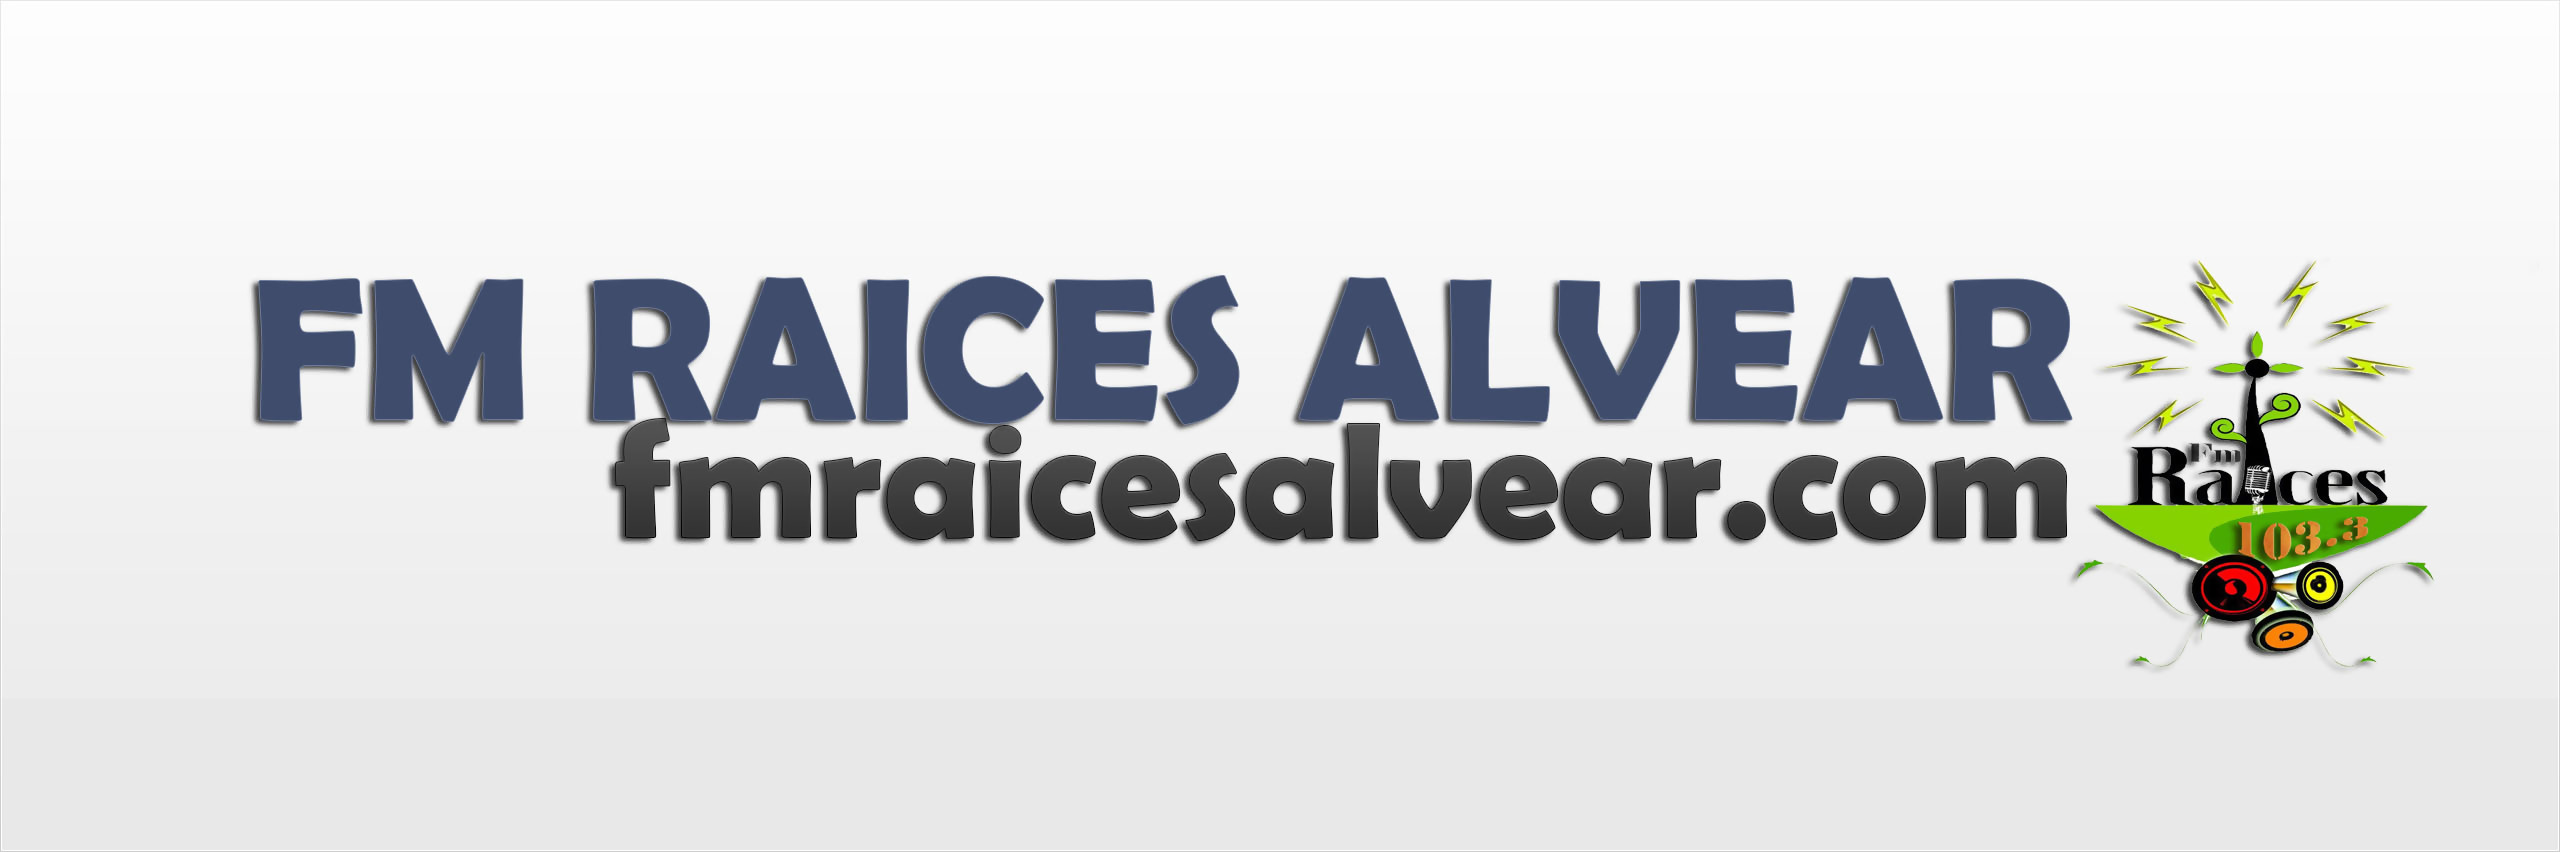 Fm Raices Alvear 103.3